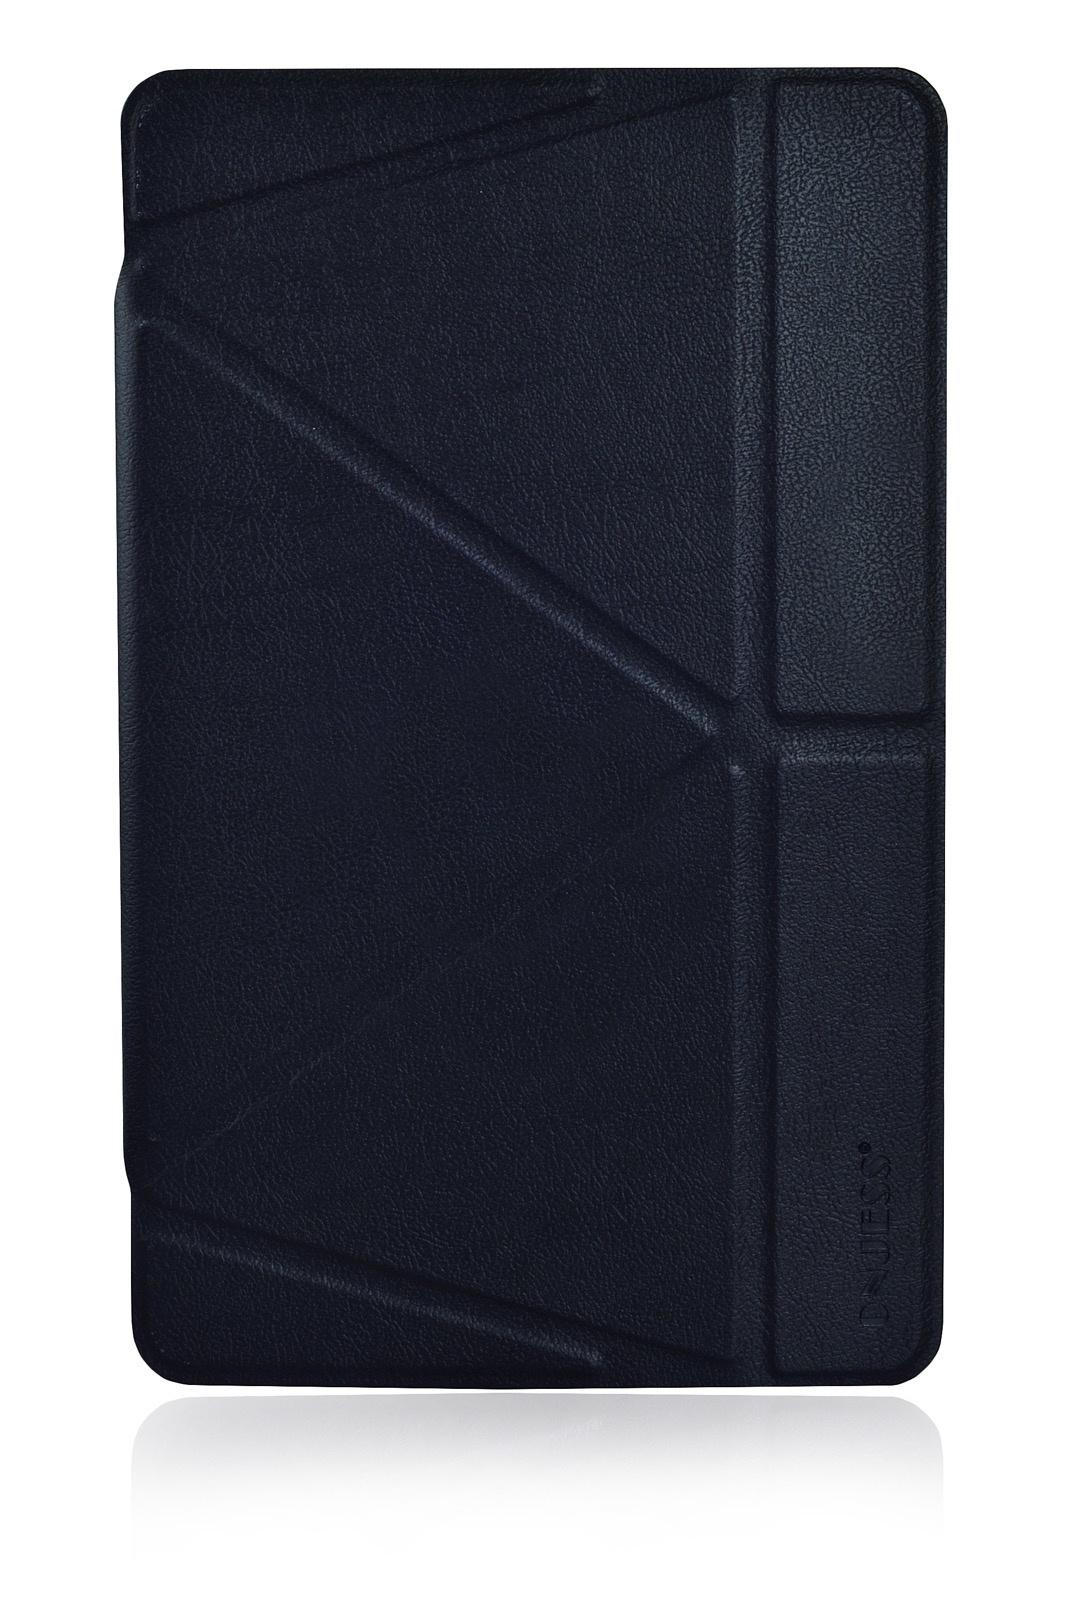 Чехол для планшета Onjess Smart для Samsung Tab S4 10.5 T835, 908029, черный аксессуар чехол onjess для samsung tab s4 10 5 t835 smart grey 908031